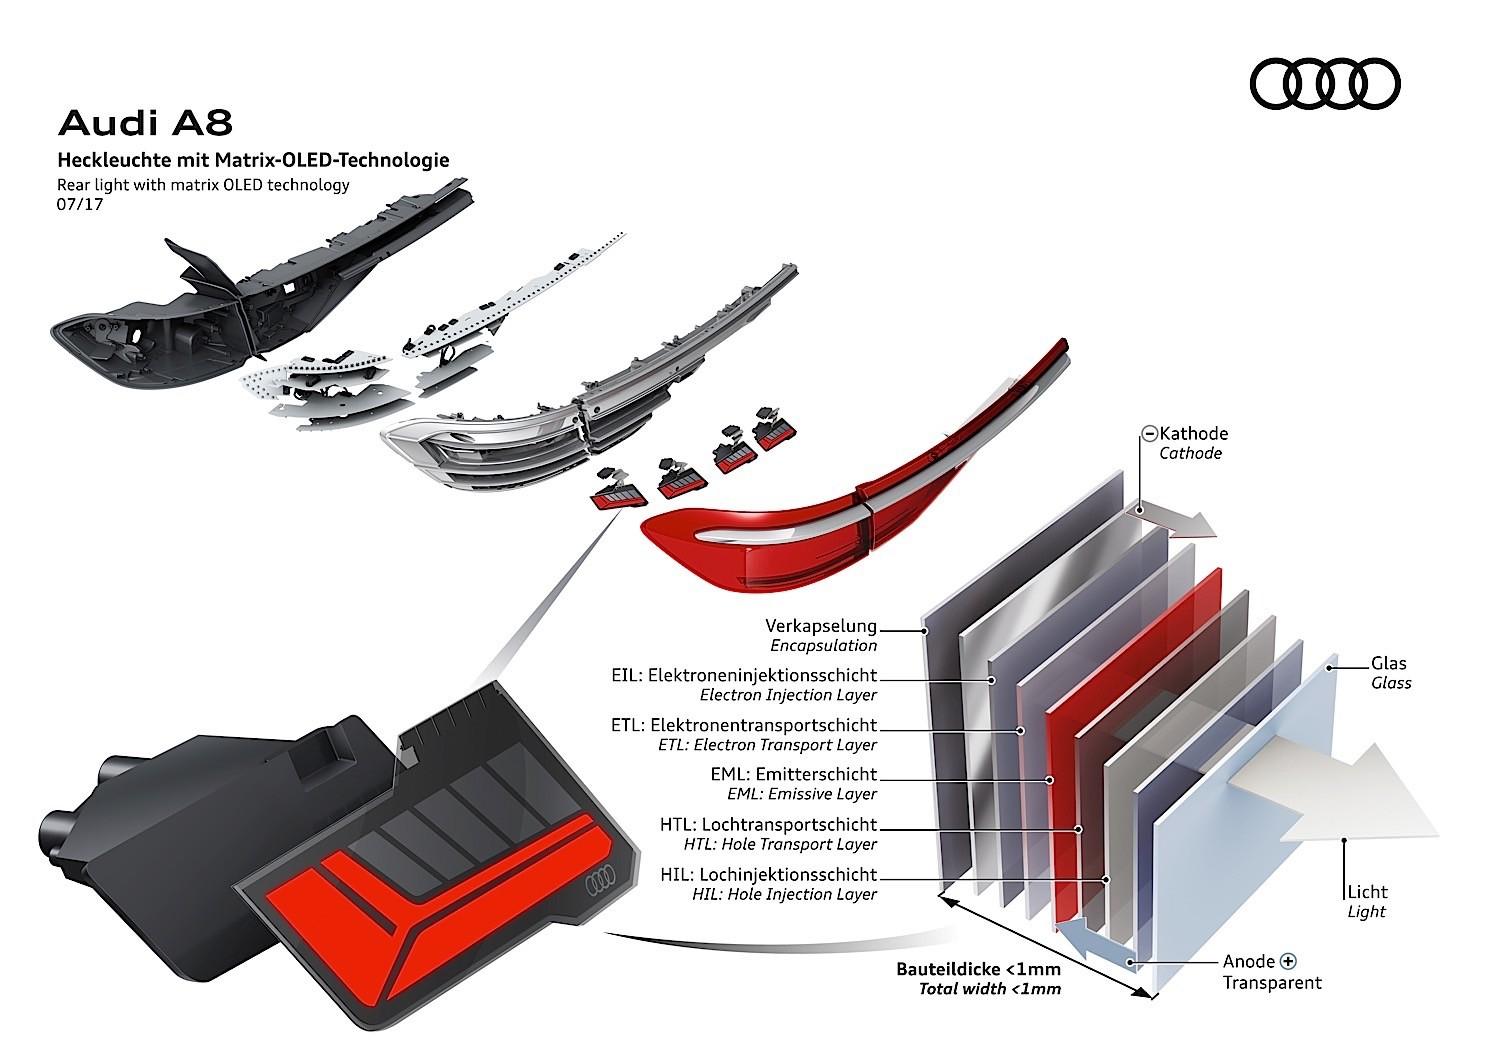 hight resolution of audi w12 engine diagram index listing of wiring diagramsaudi a8 v1 0 engine diagram wiring diagram